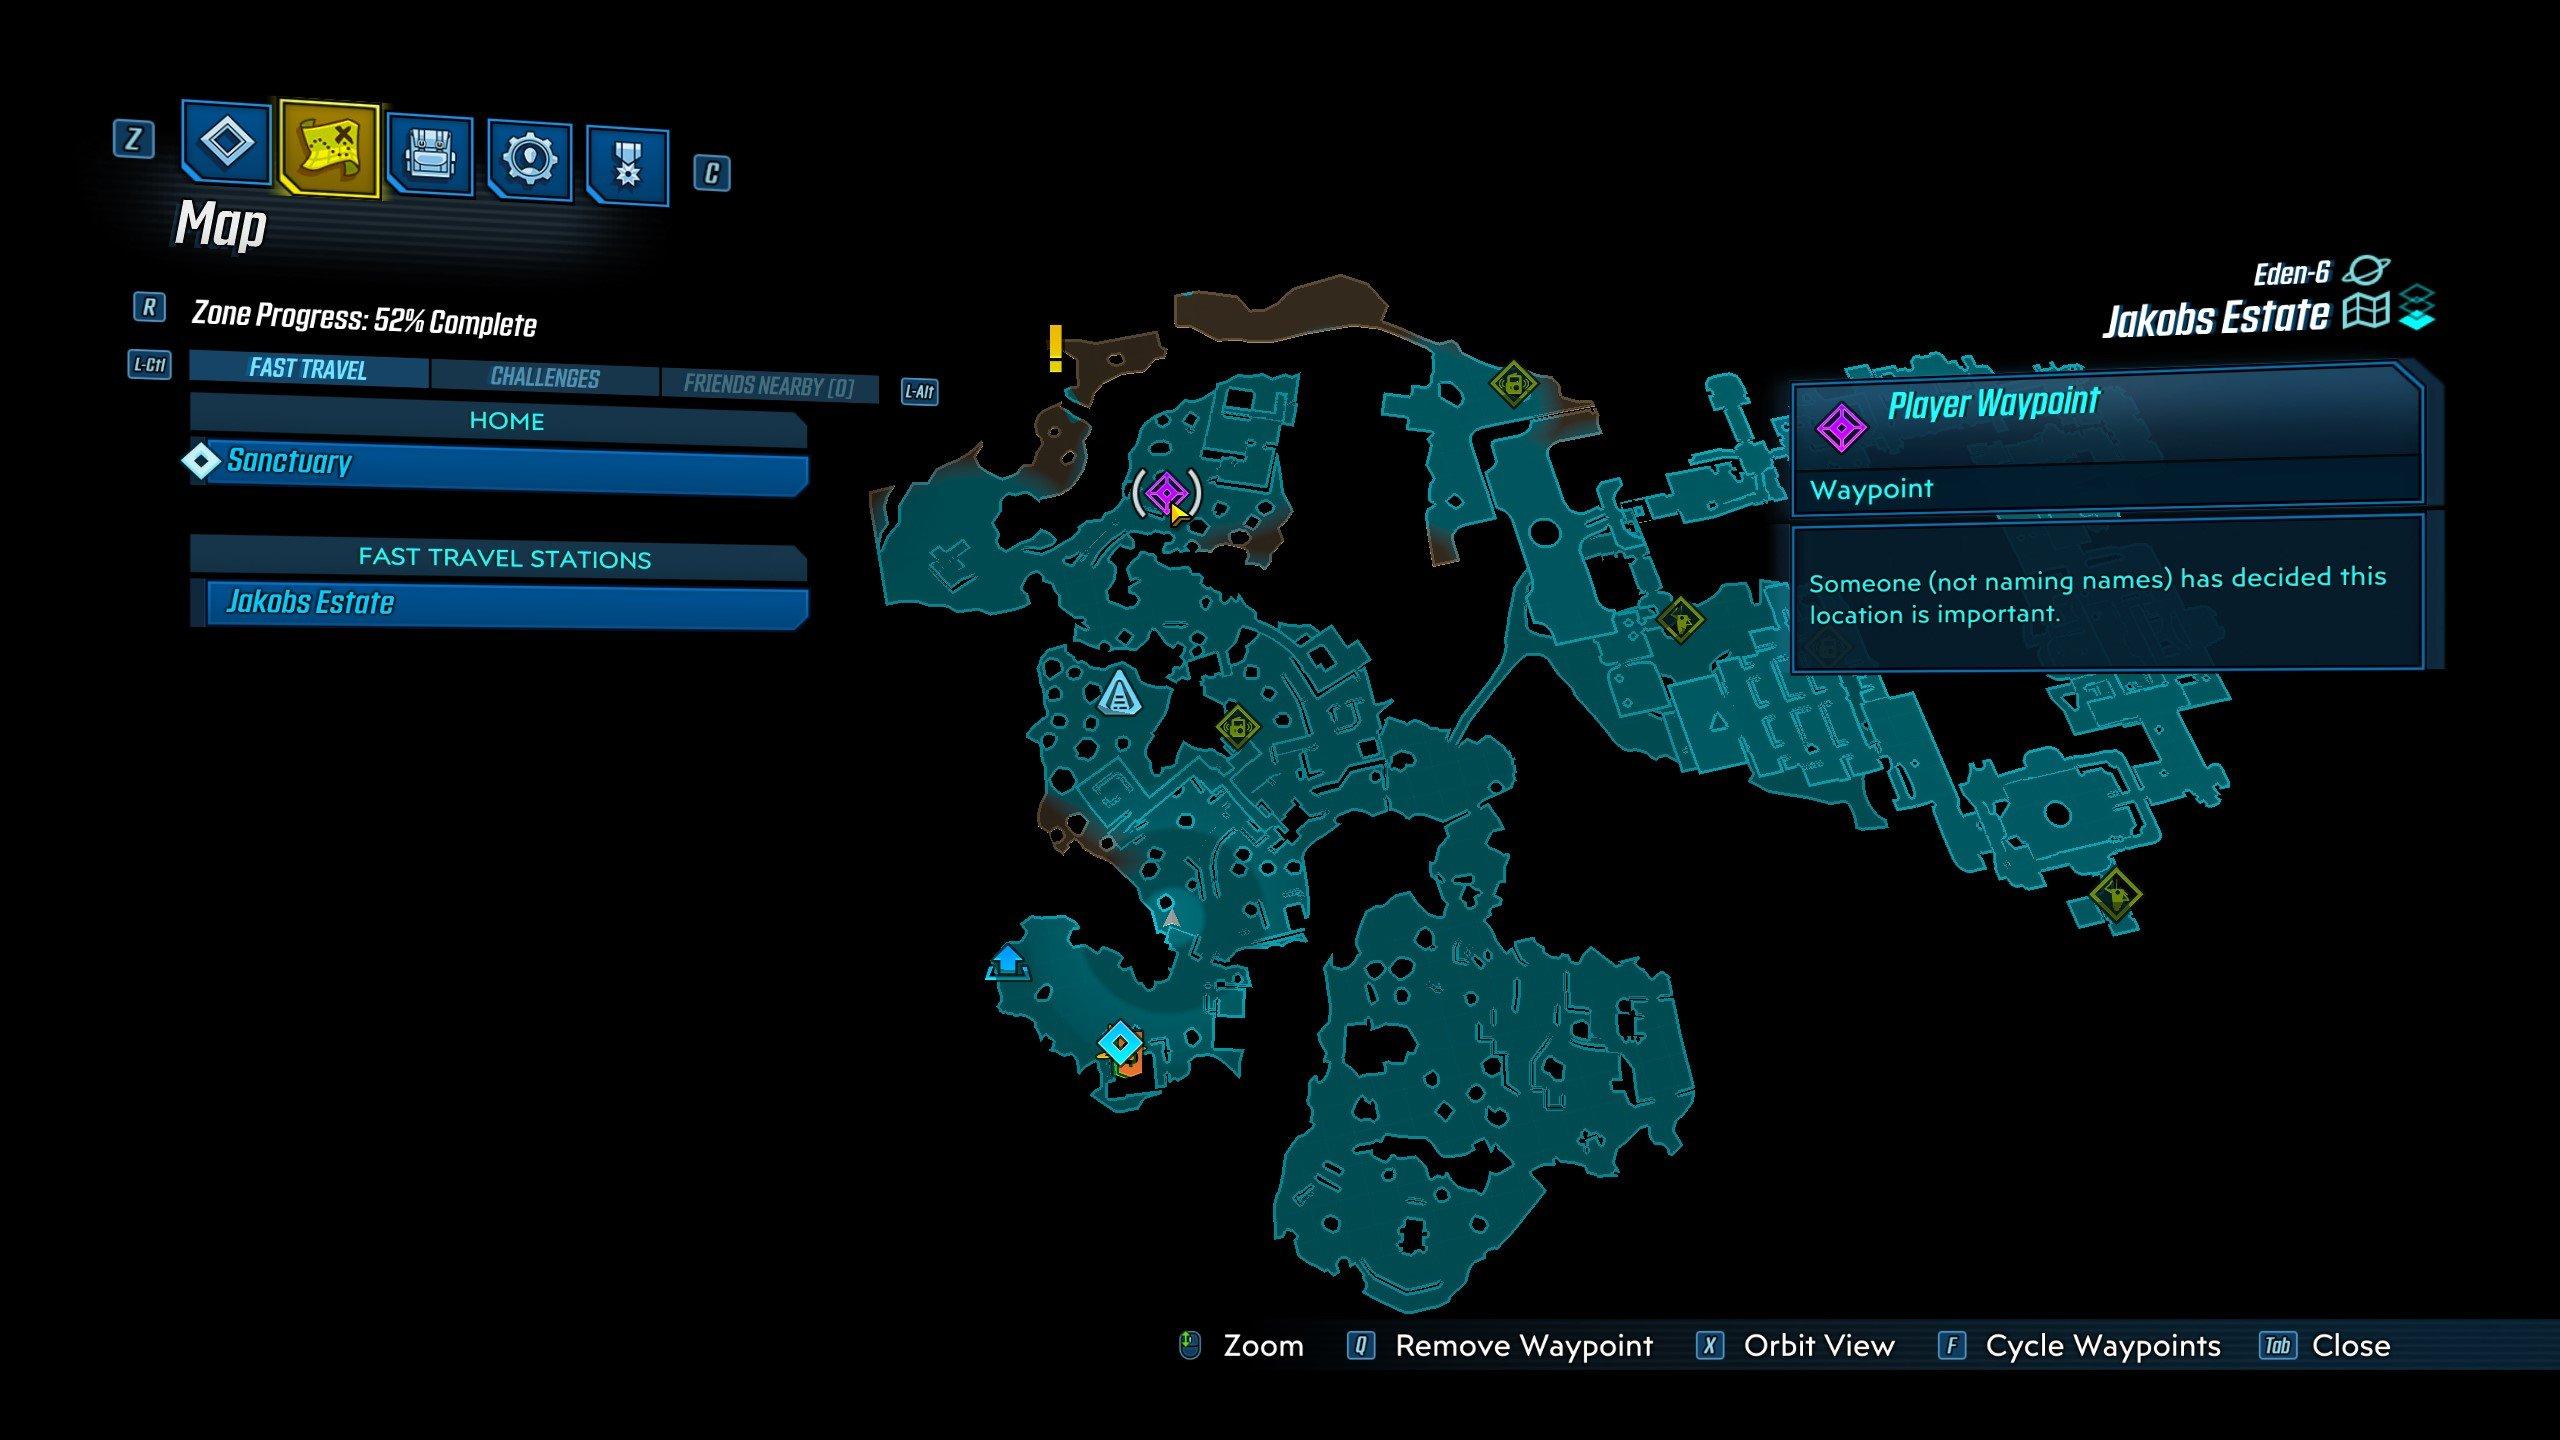 Borderlands 3 loot cave on Eden-6 location